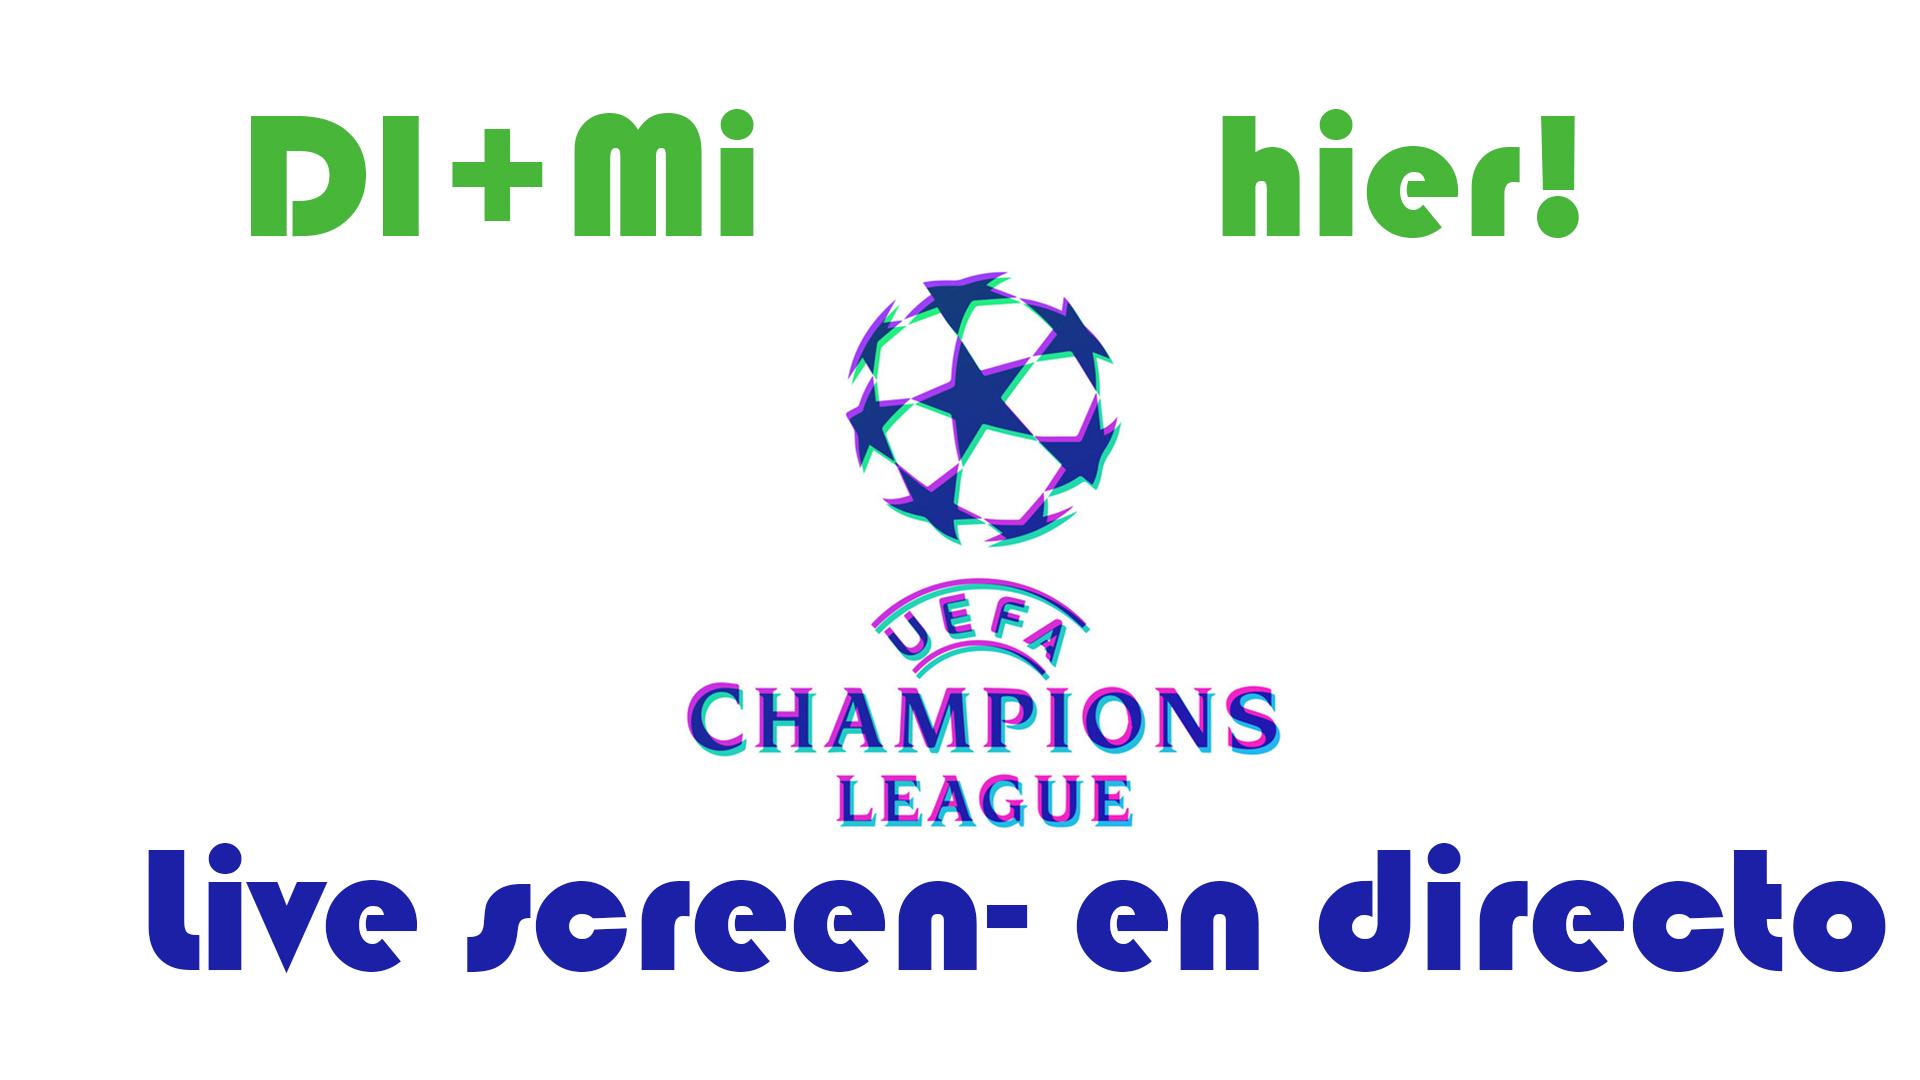 championsleaguelogoplakat